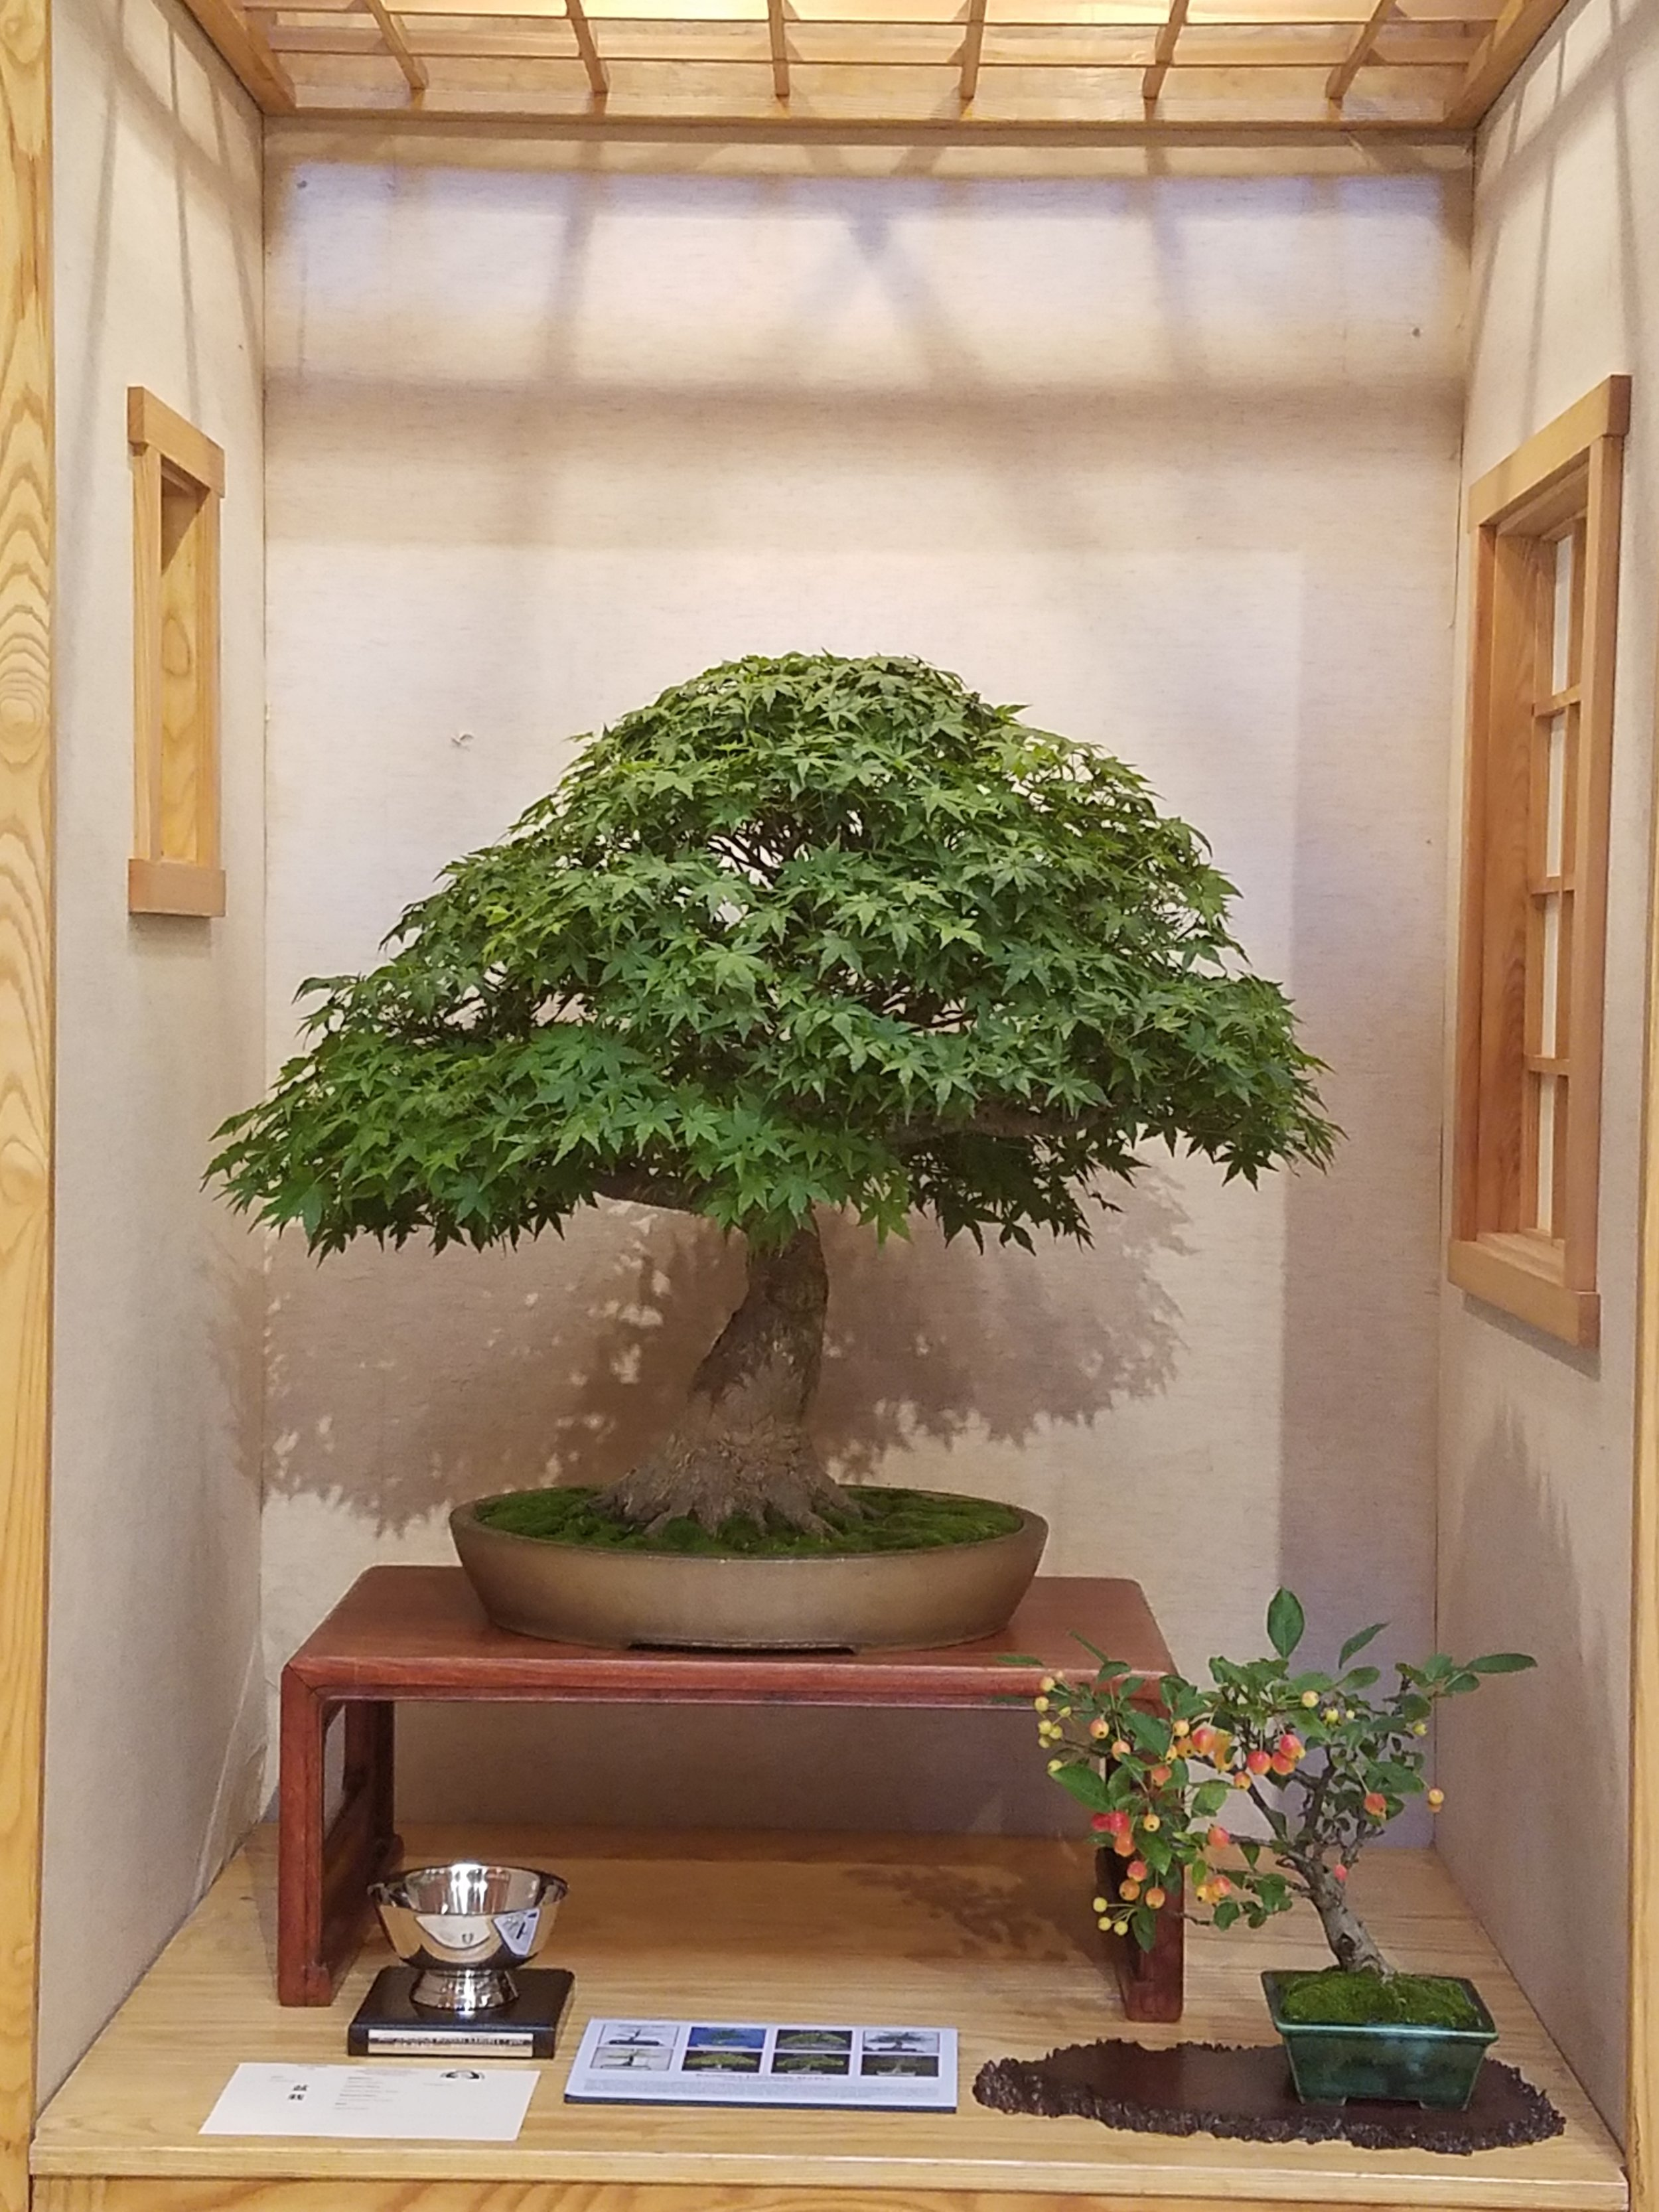 2017 Mid-America Bonsai Exhibition - Kashima Japanese Maple - Informal Upright